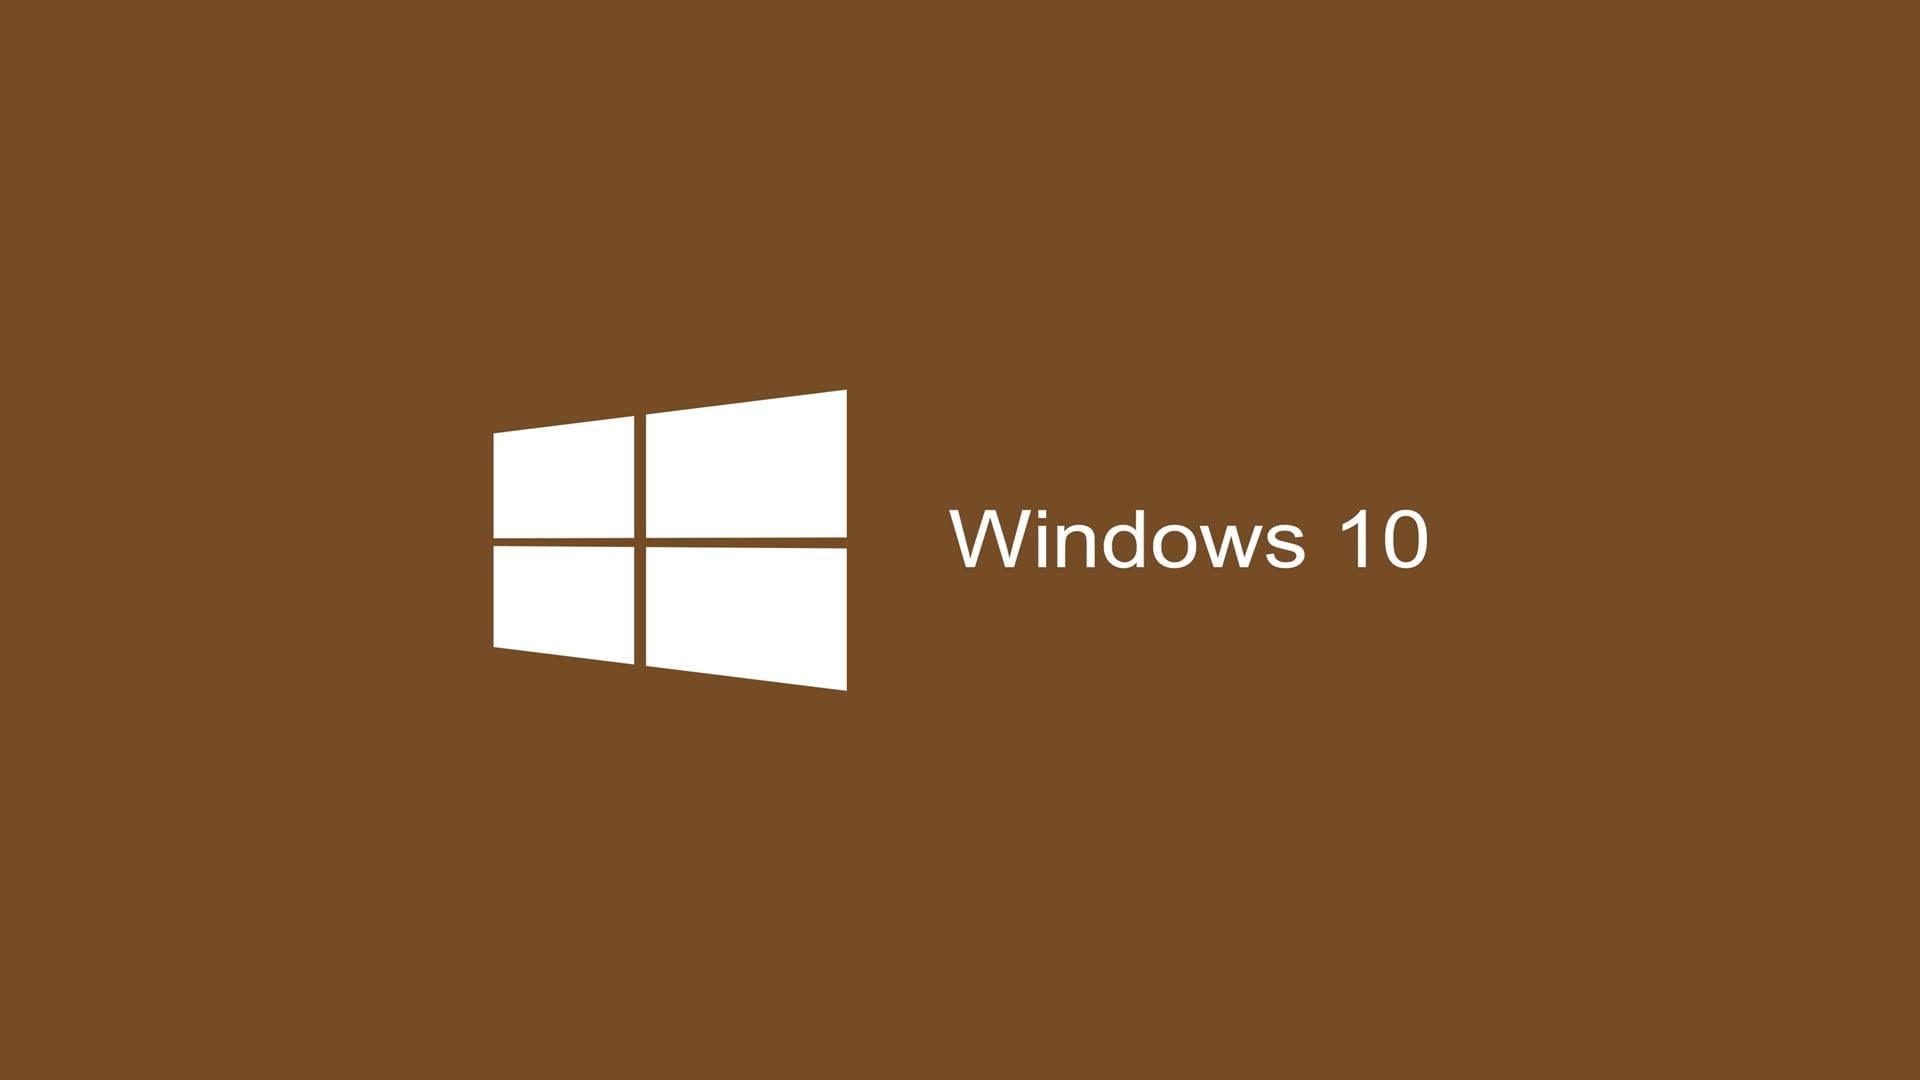 Papéis de parede do Windows 10 1